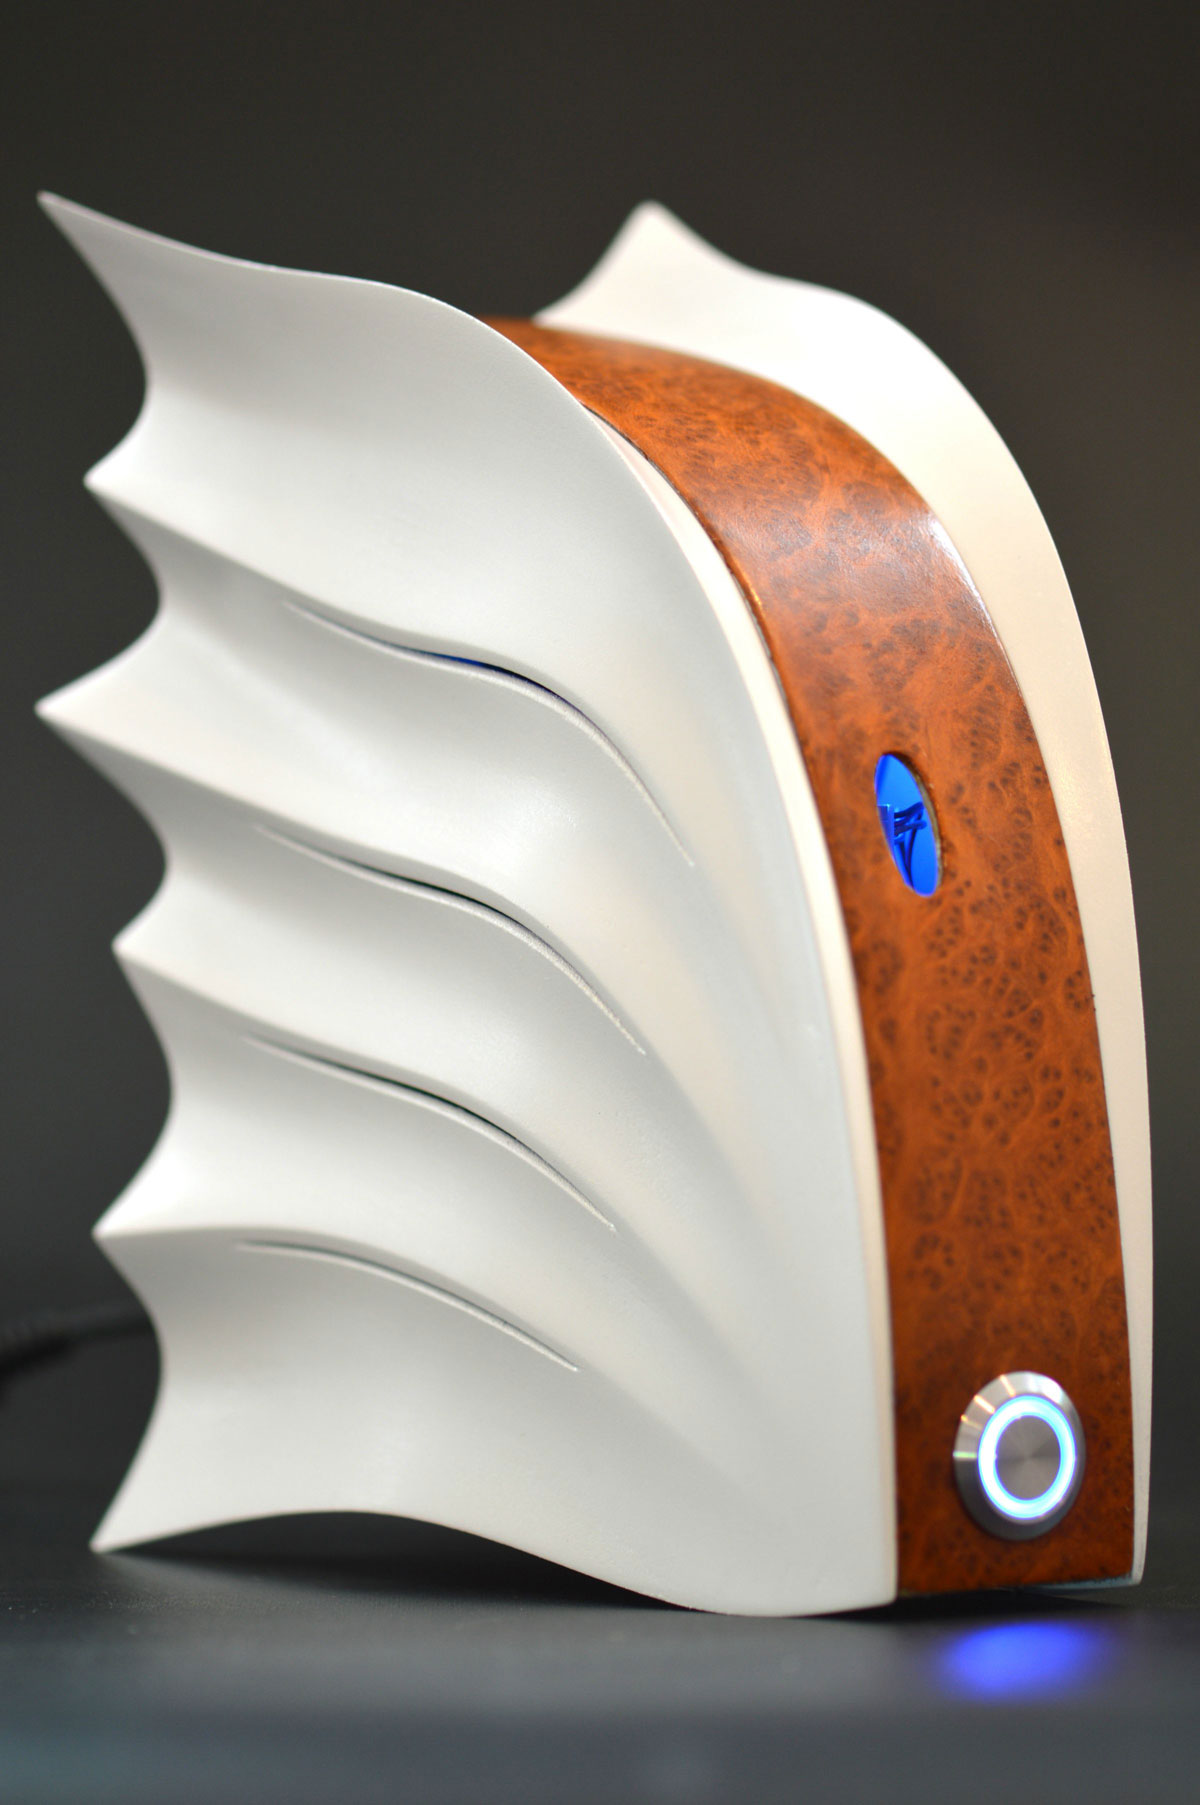 3D Printed Computer Case Vesper- 3D Printing Industry